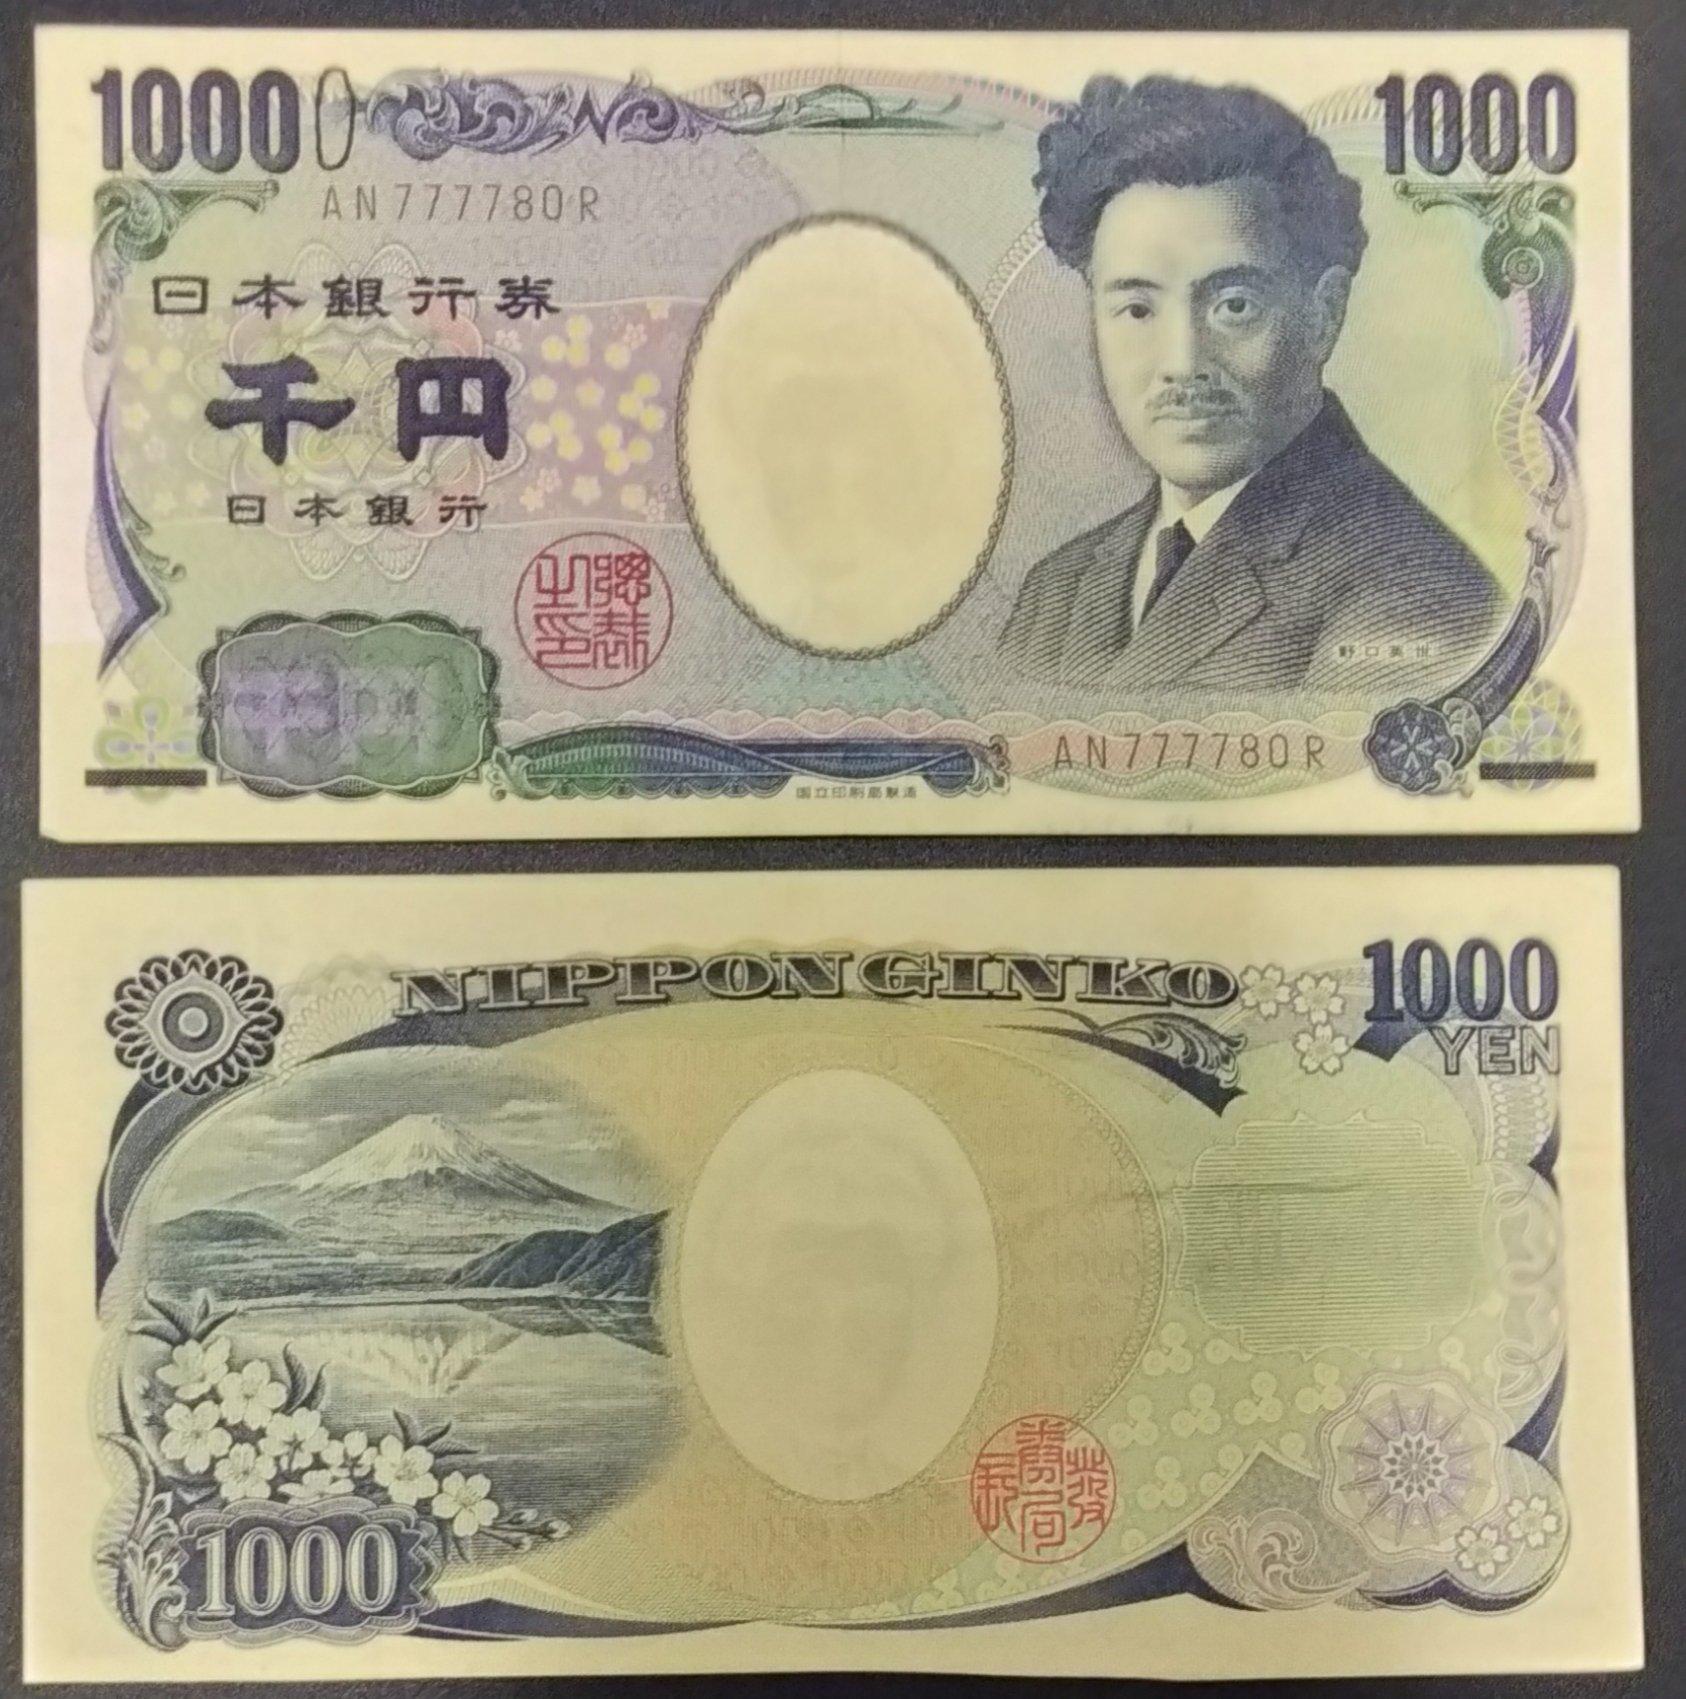 Japan 1000 yen banknote for sale